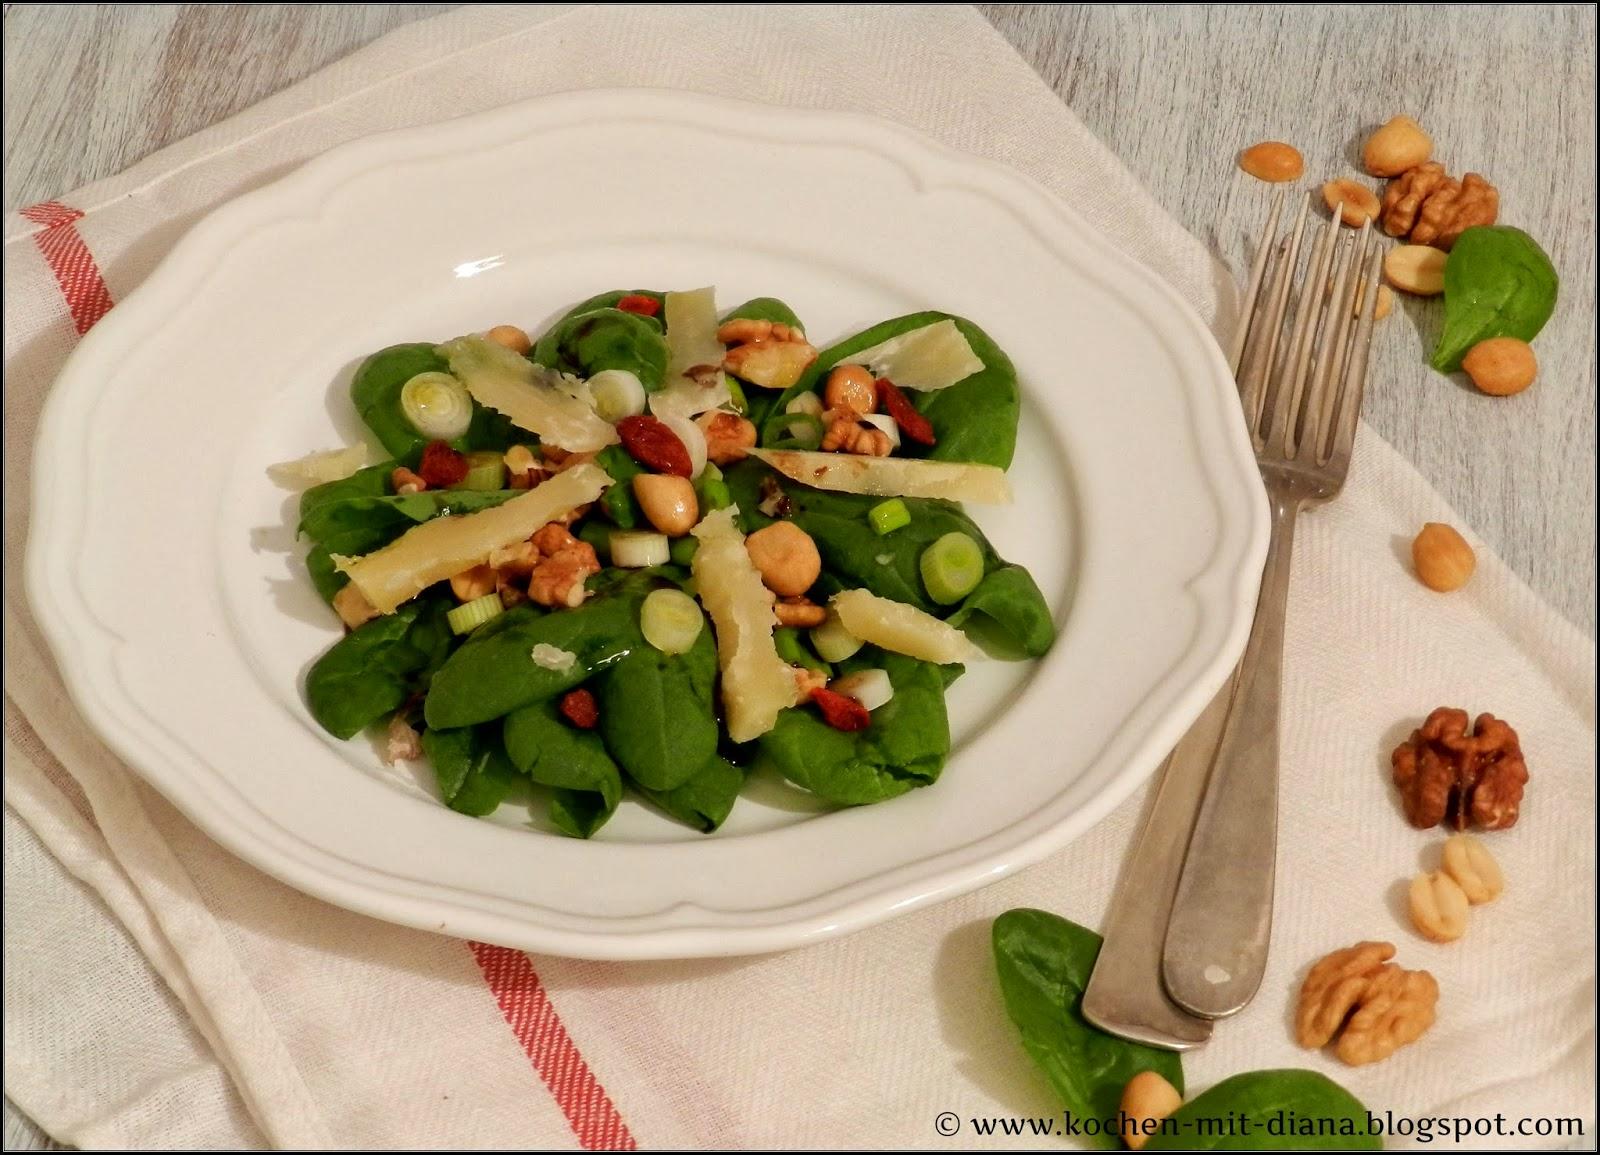 Spinatsalat mit Nüsse und Grana Padano Käse